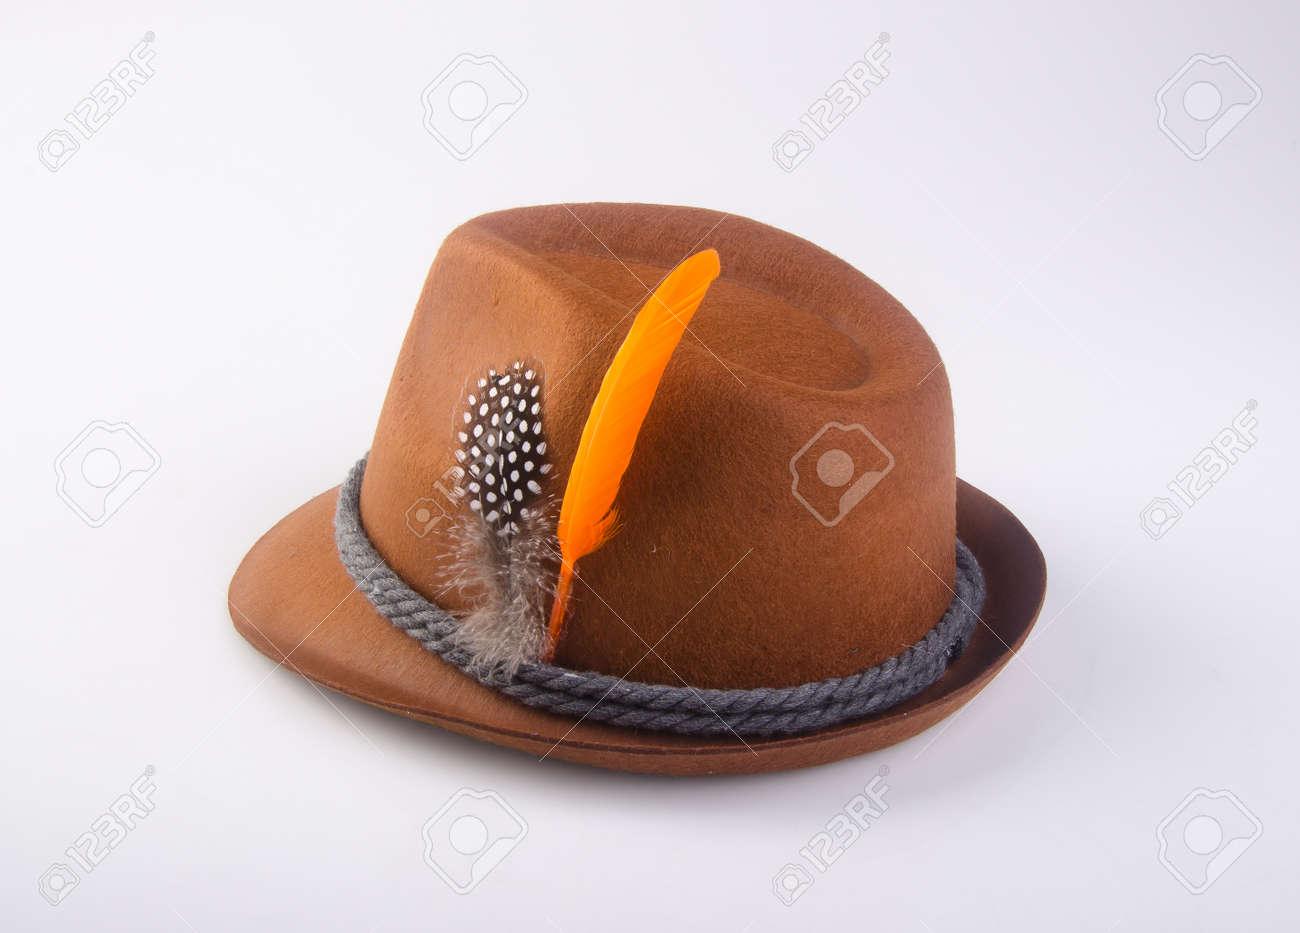 18339875629 hat or oktoberfest bavarian hat on a background Stock Photo - 96935148